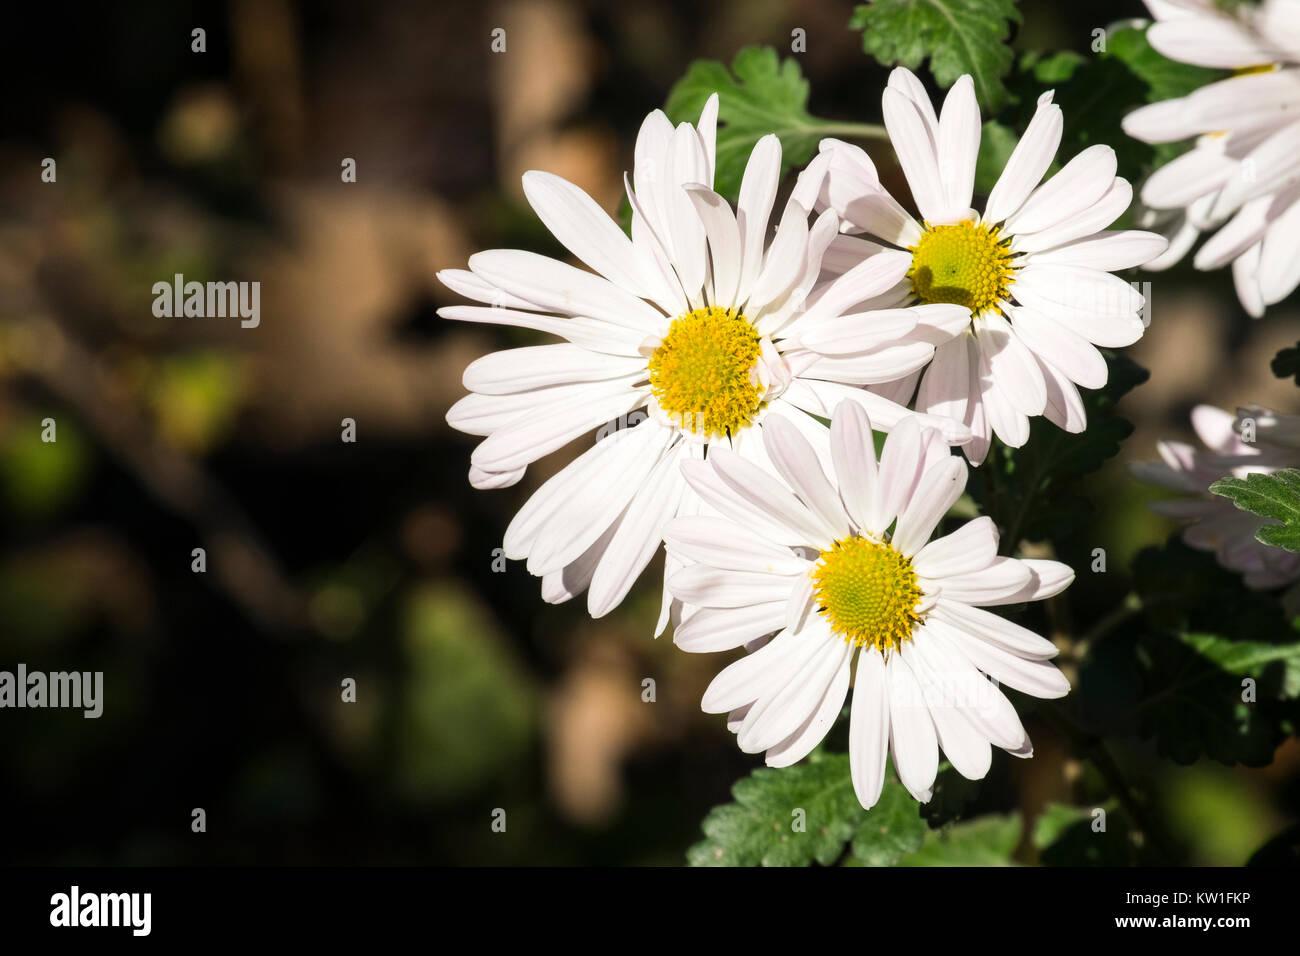 Large white flowers of max chrysanthemum (Leucanthemum maximum) - Stock Image